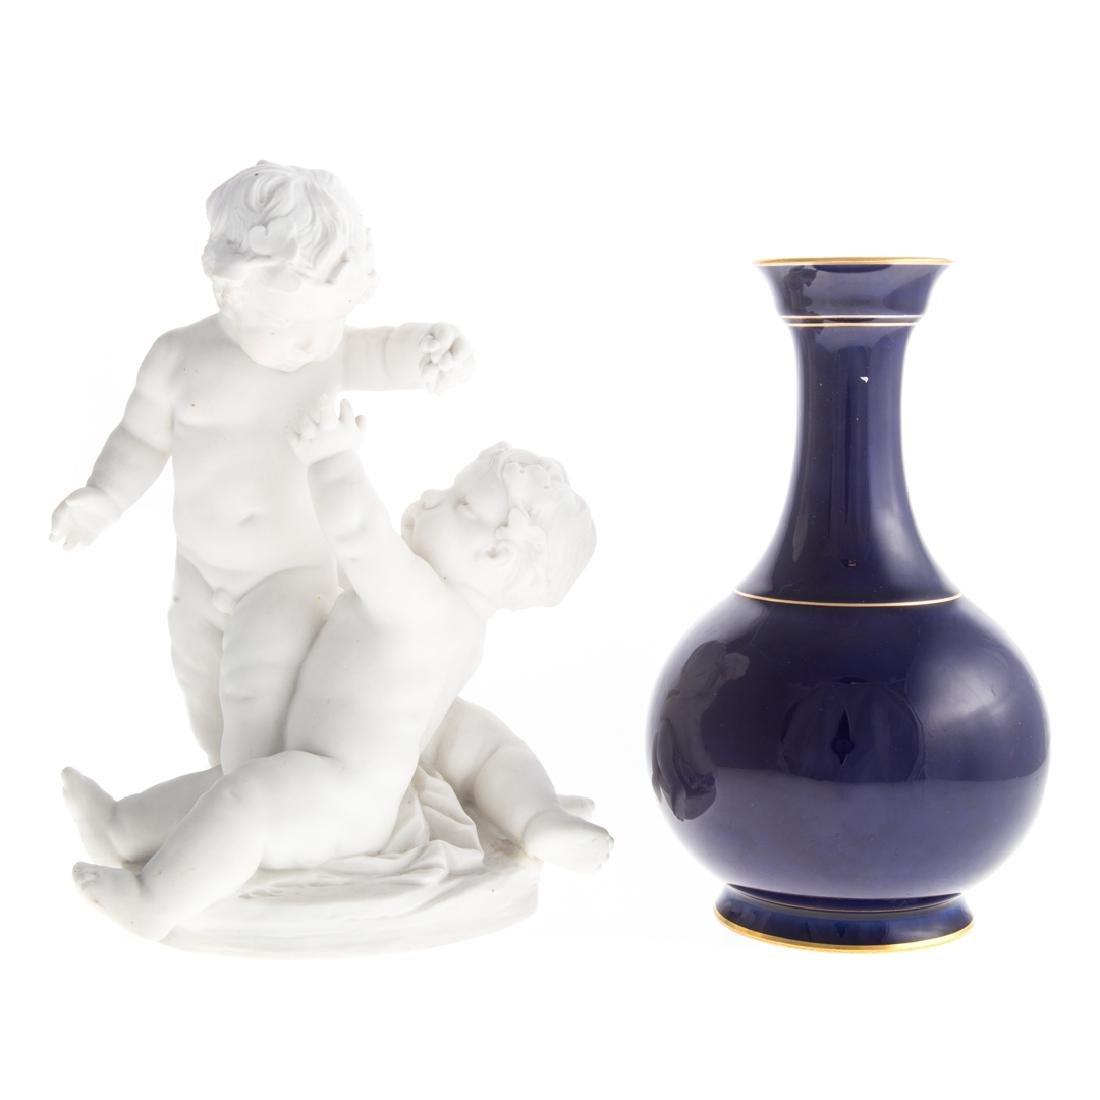 Sevres porcelain vase and bisque group